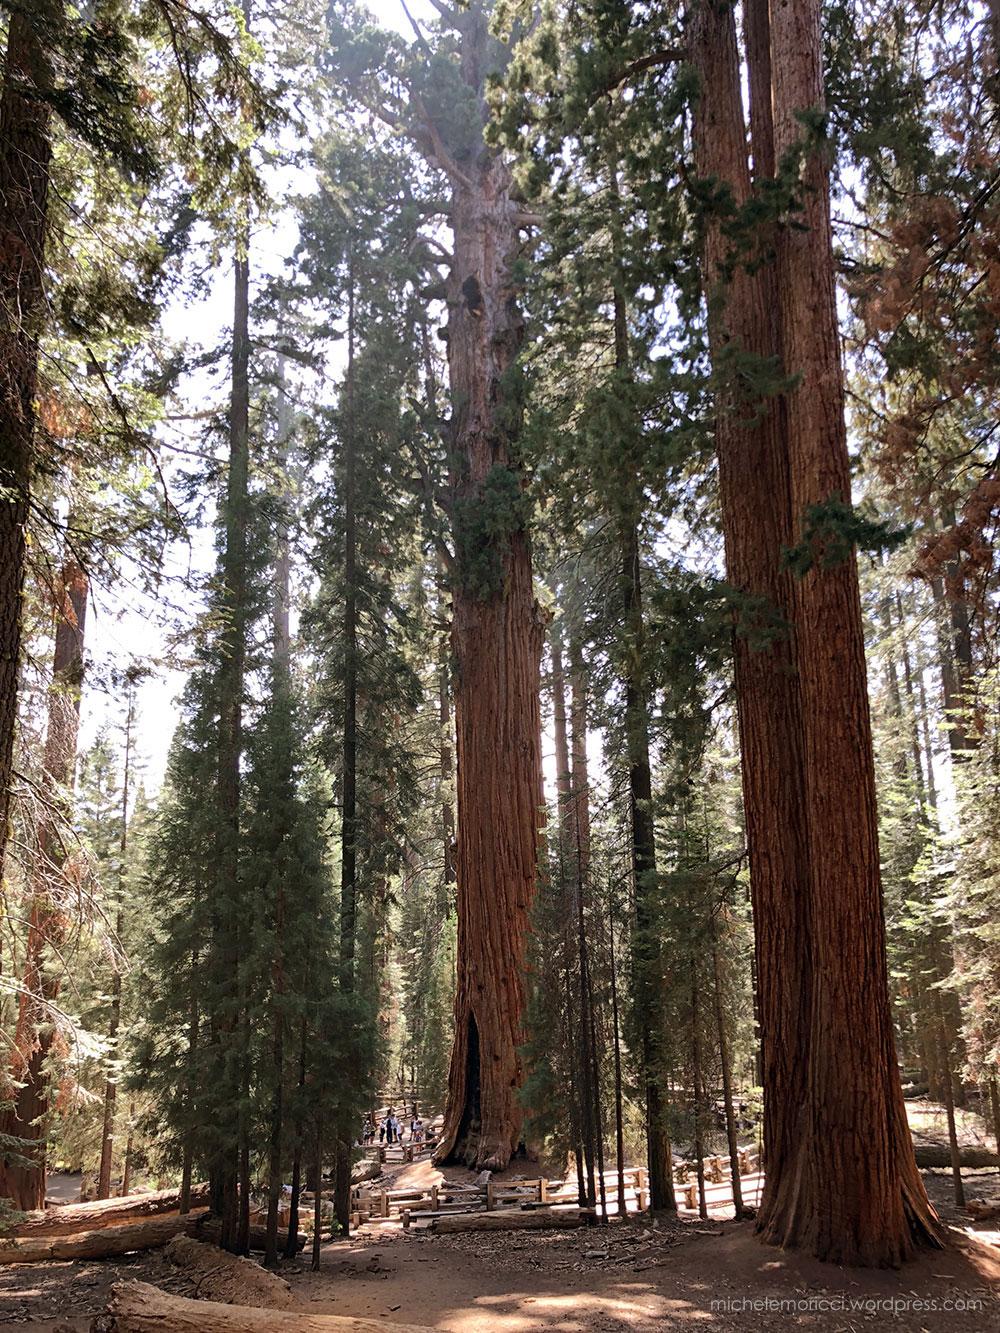 SequoiaPark-MMoricci-2018-2